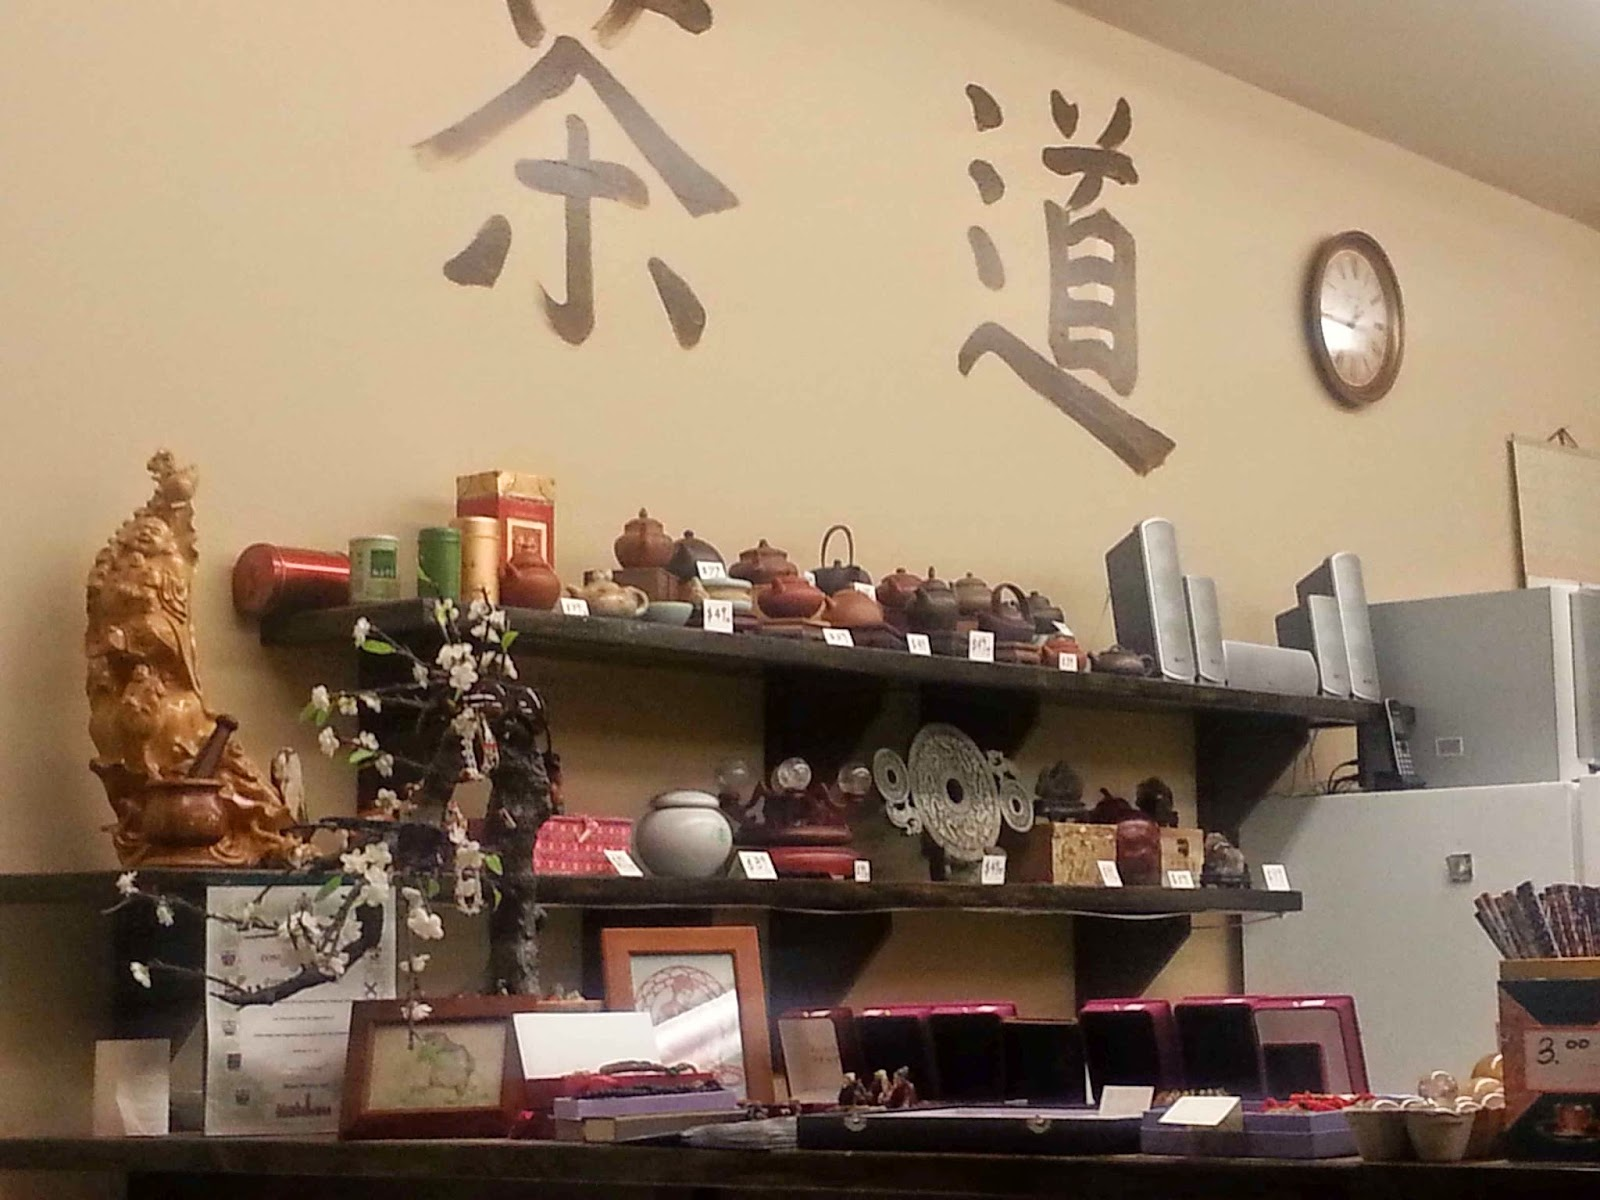 Tam Good Blog: Formosa Tea House Cafe Tea House Design on glass house cafe, coffee house cafe, muffin house cafe,